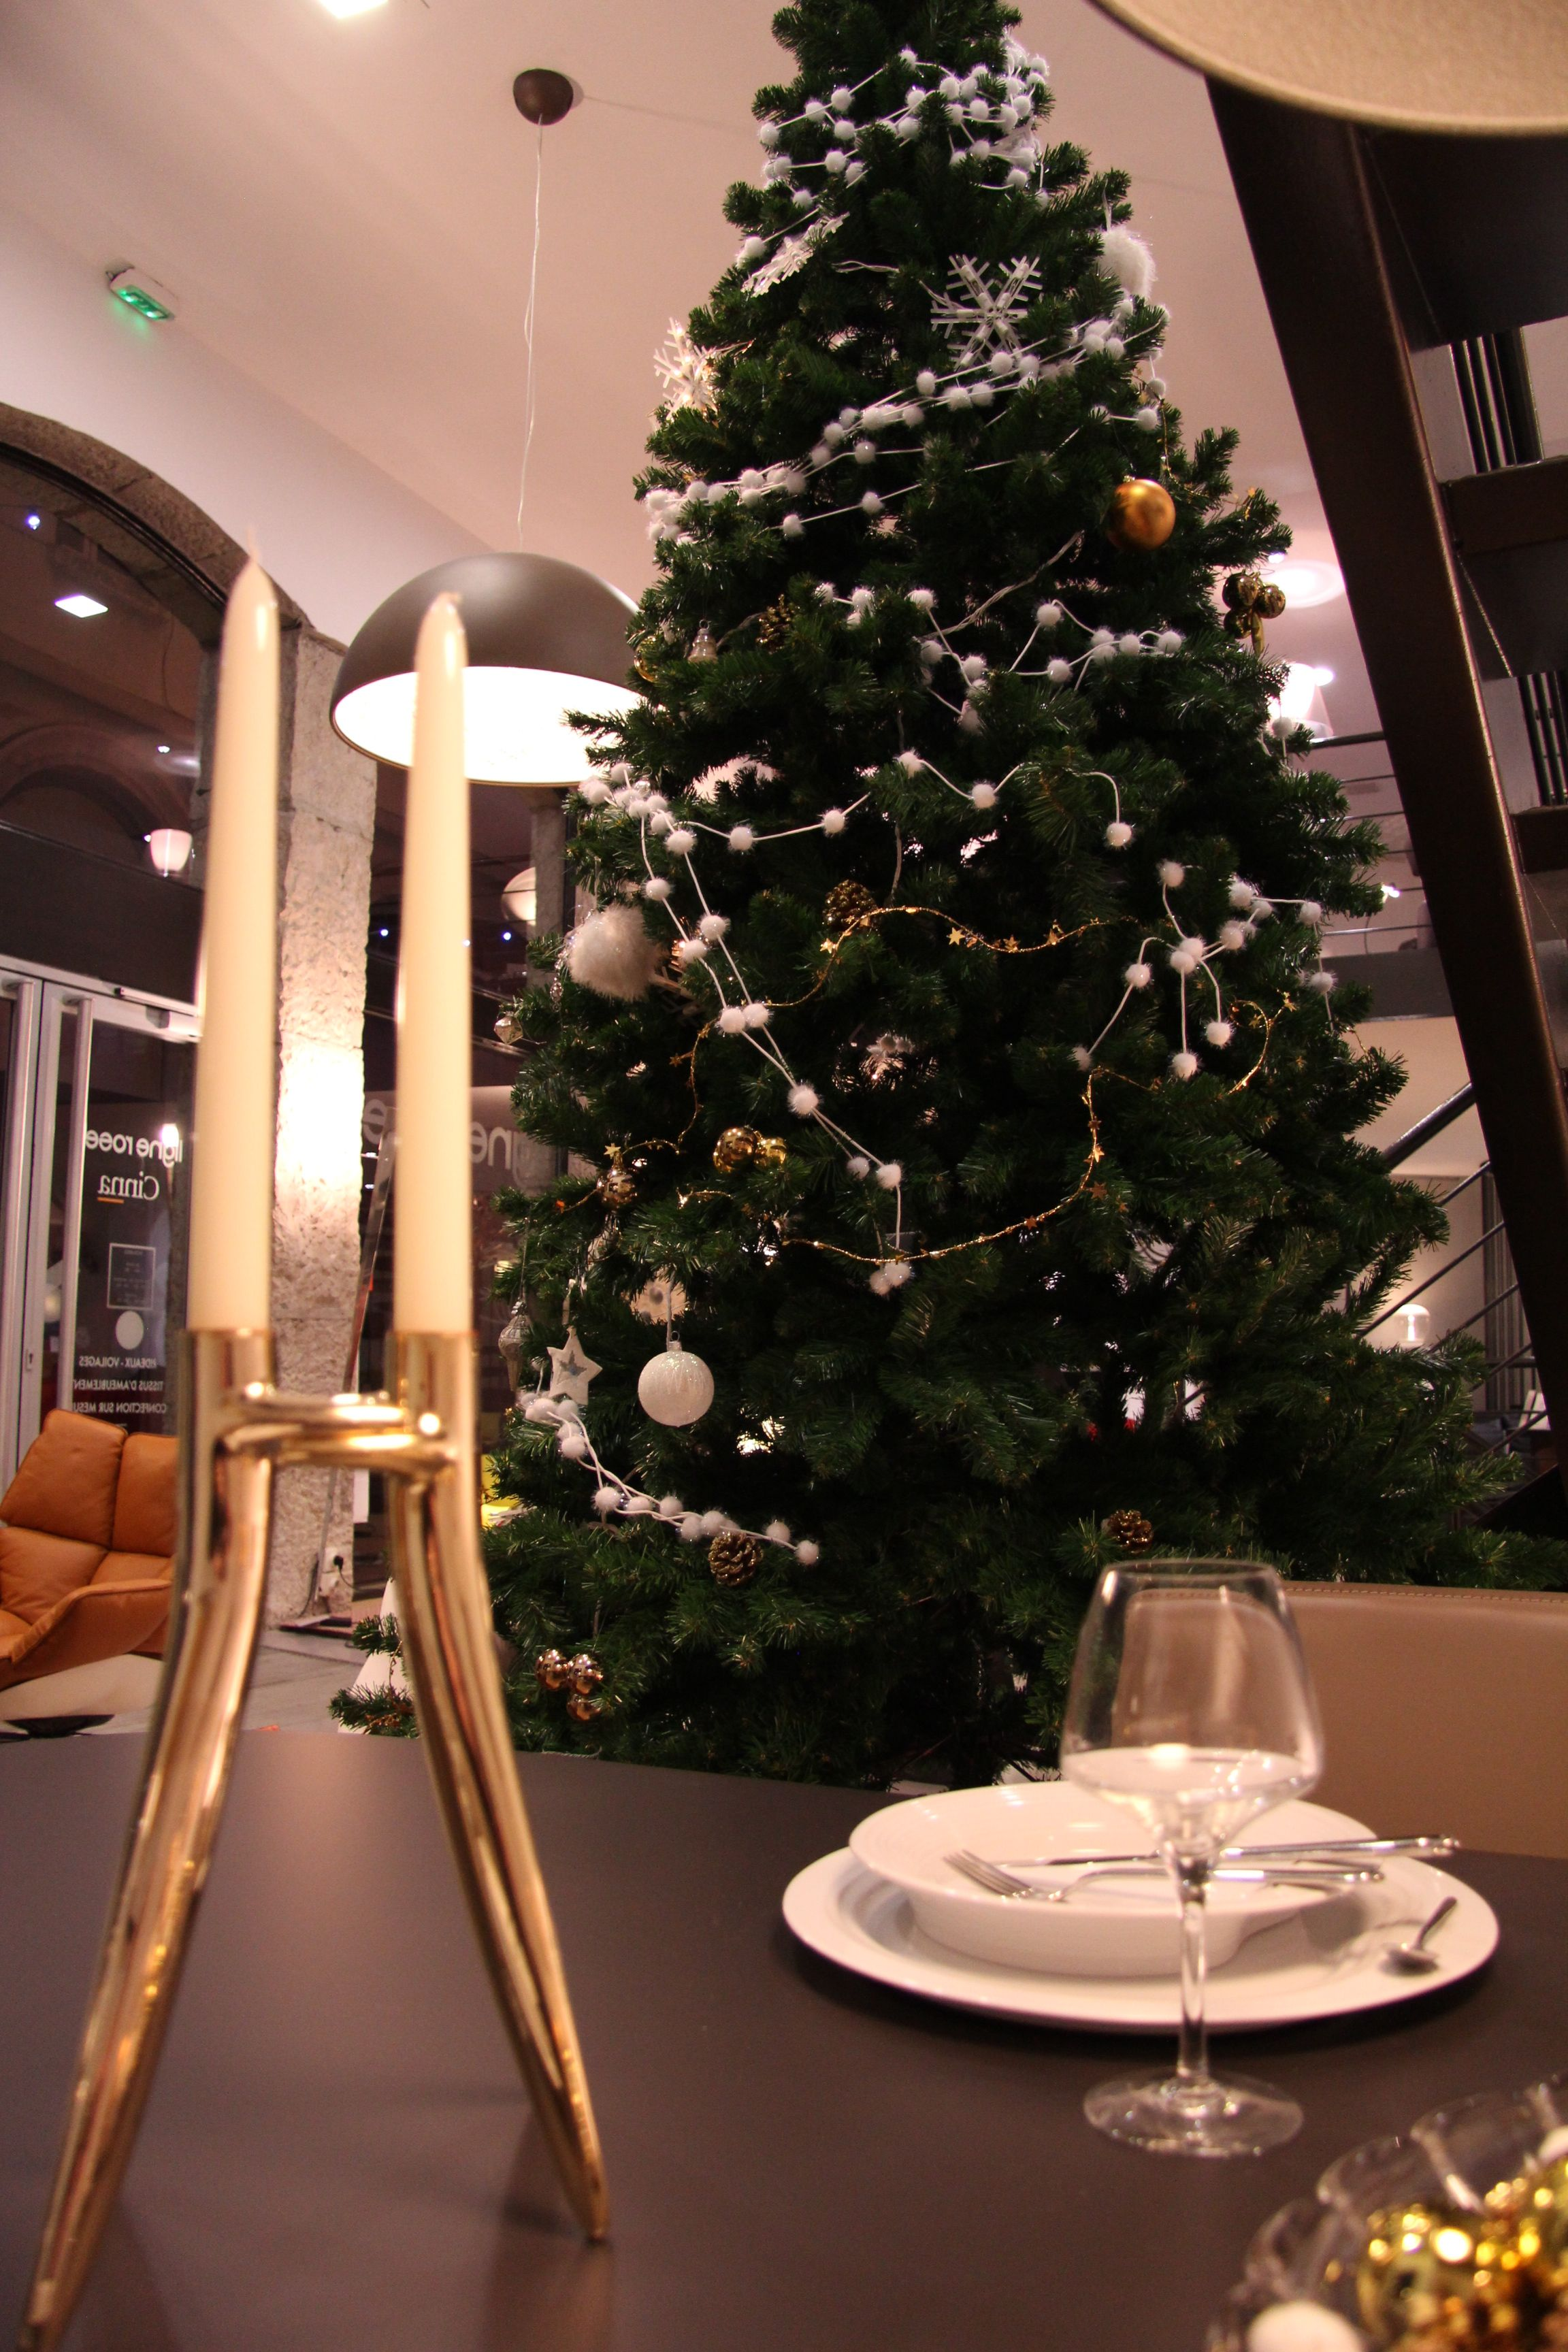 Contre Plonge Sur Le Sapin Ambiance Noel Noel 2014 Noel